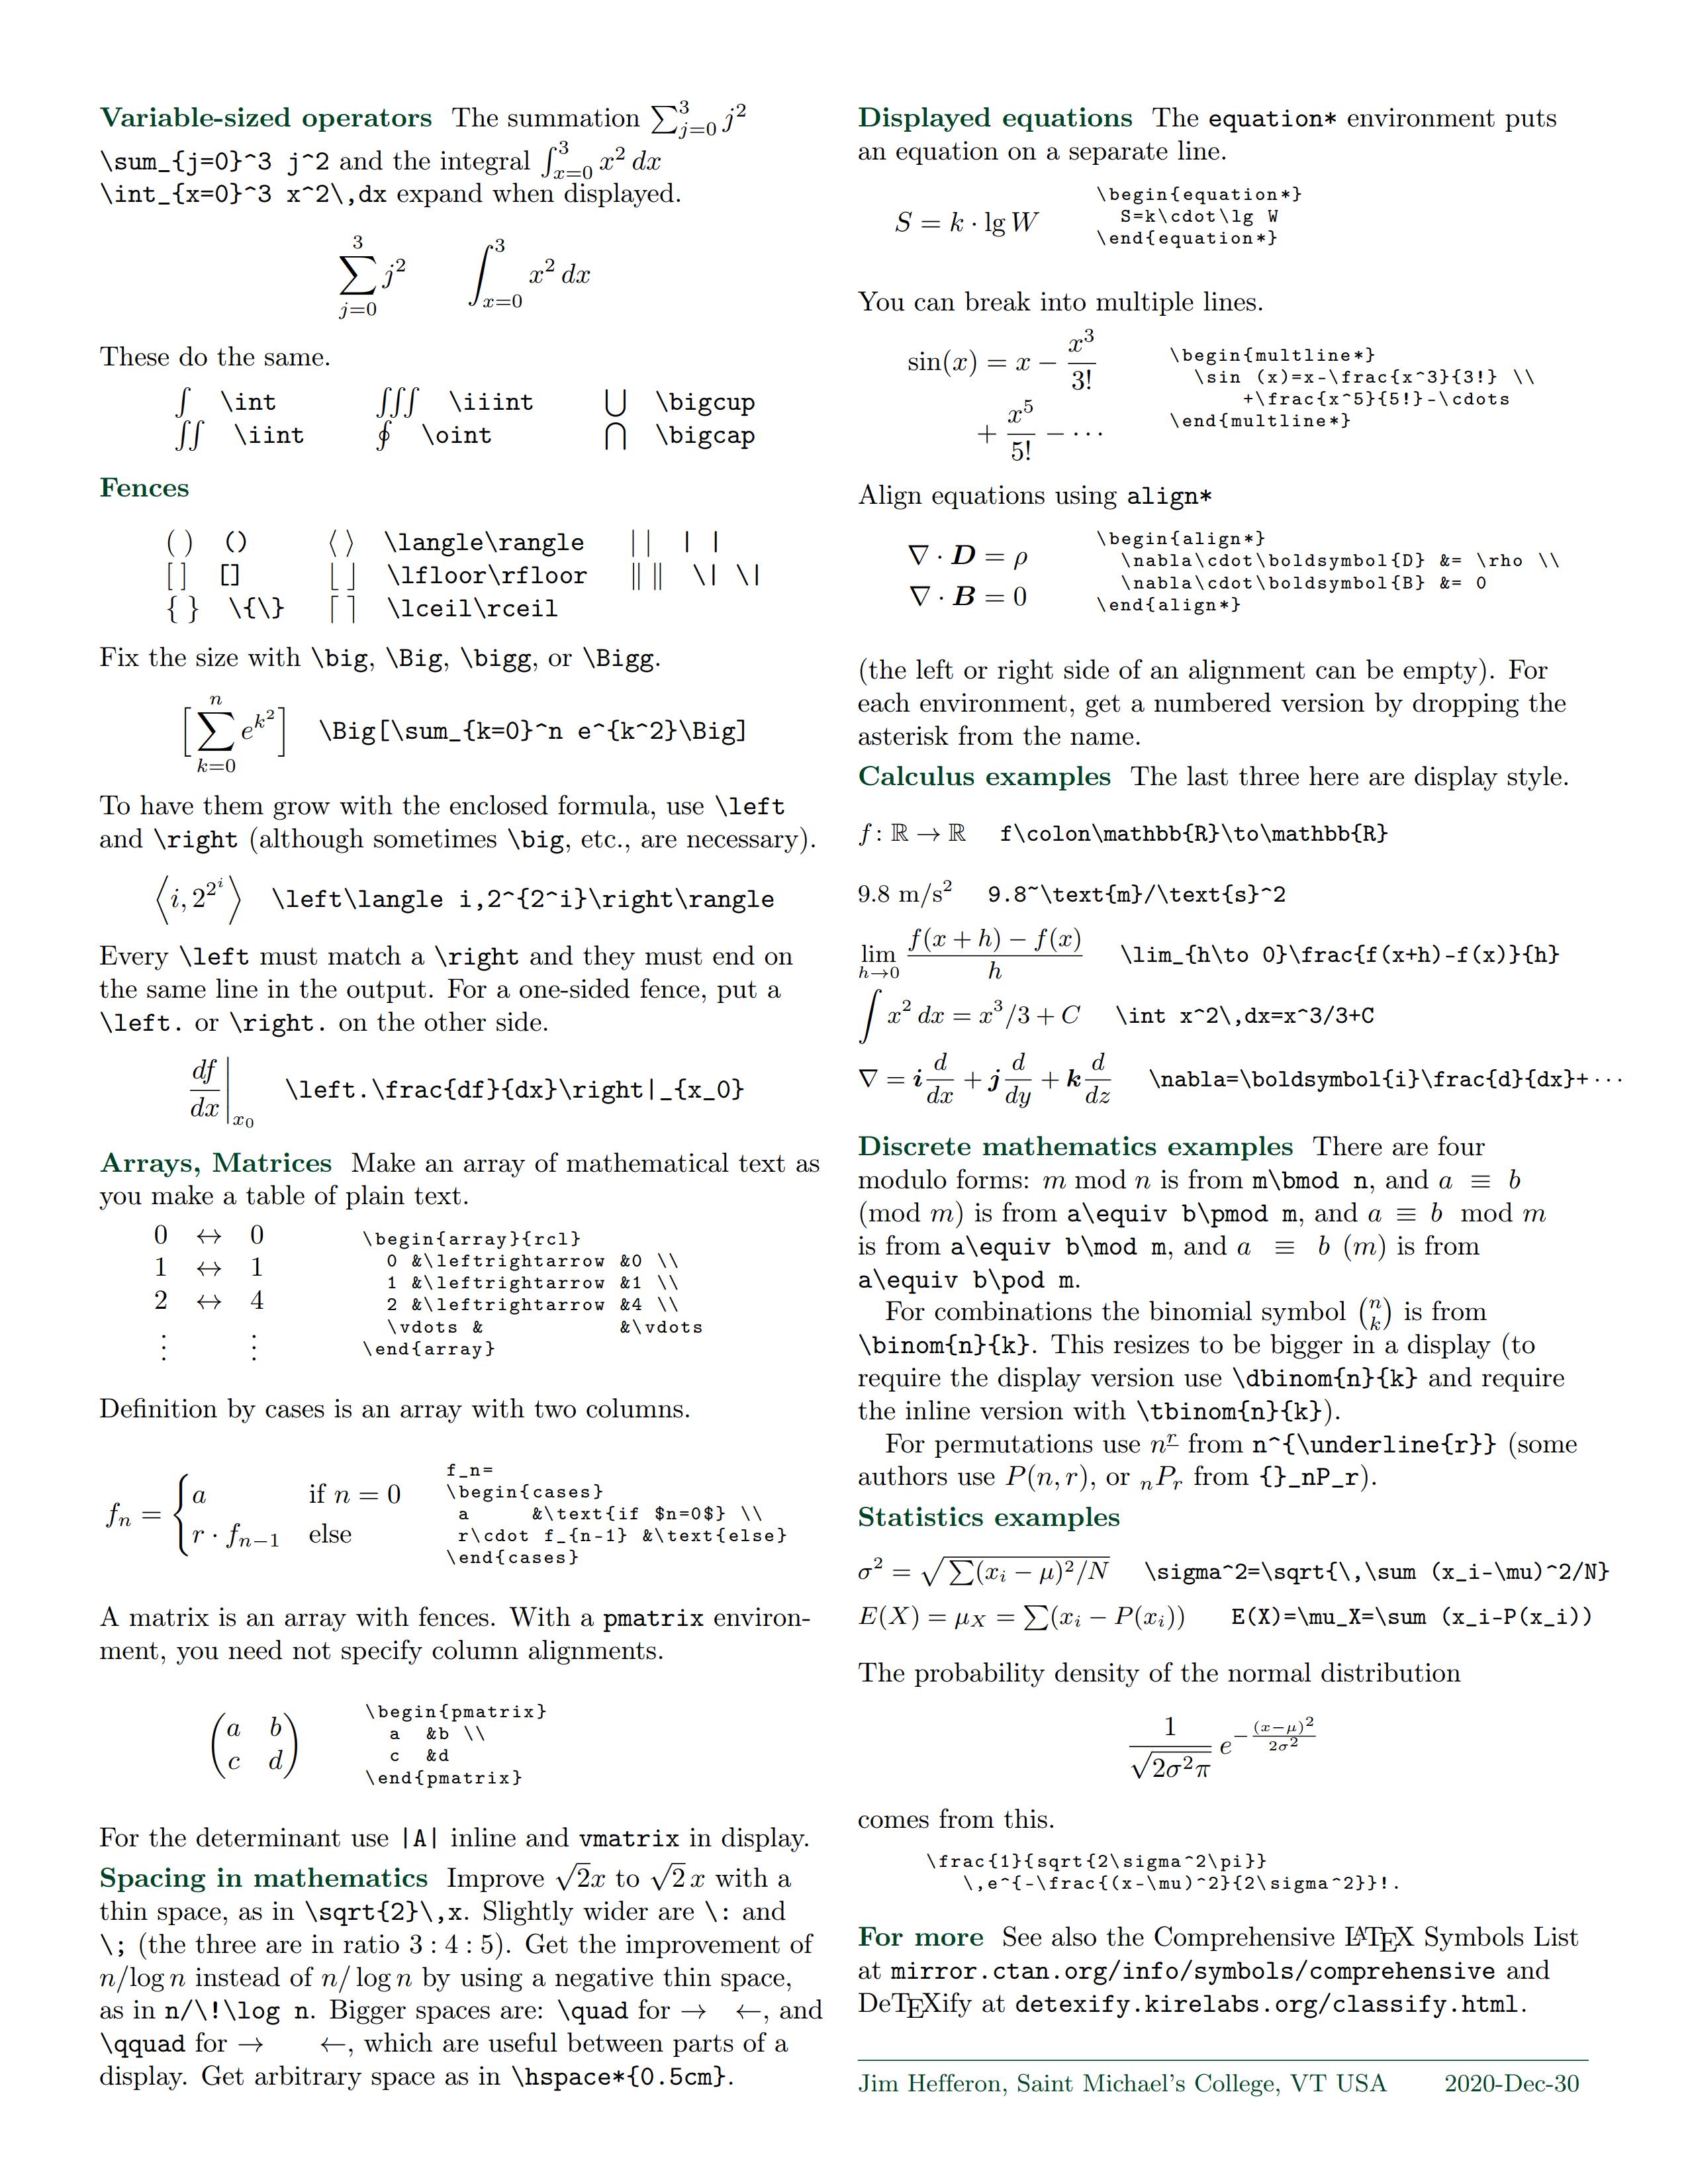 LaTeX 数学公式备忘单